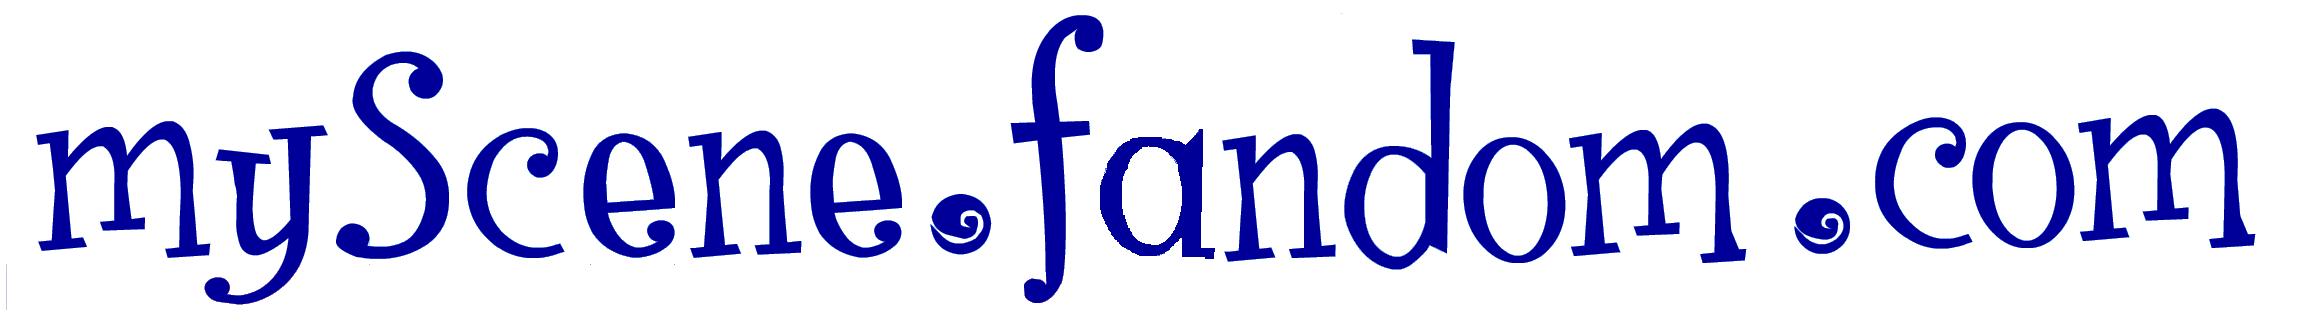 Fandom Image